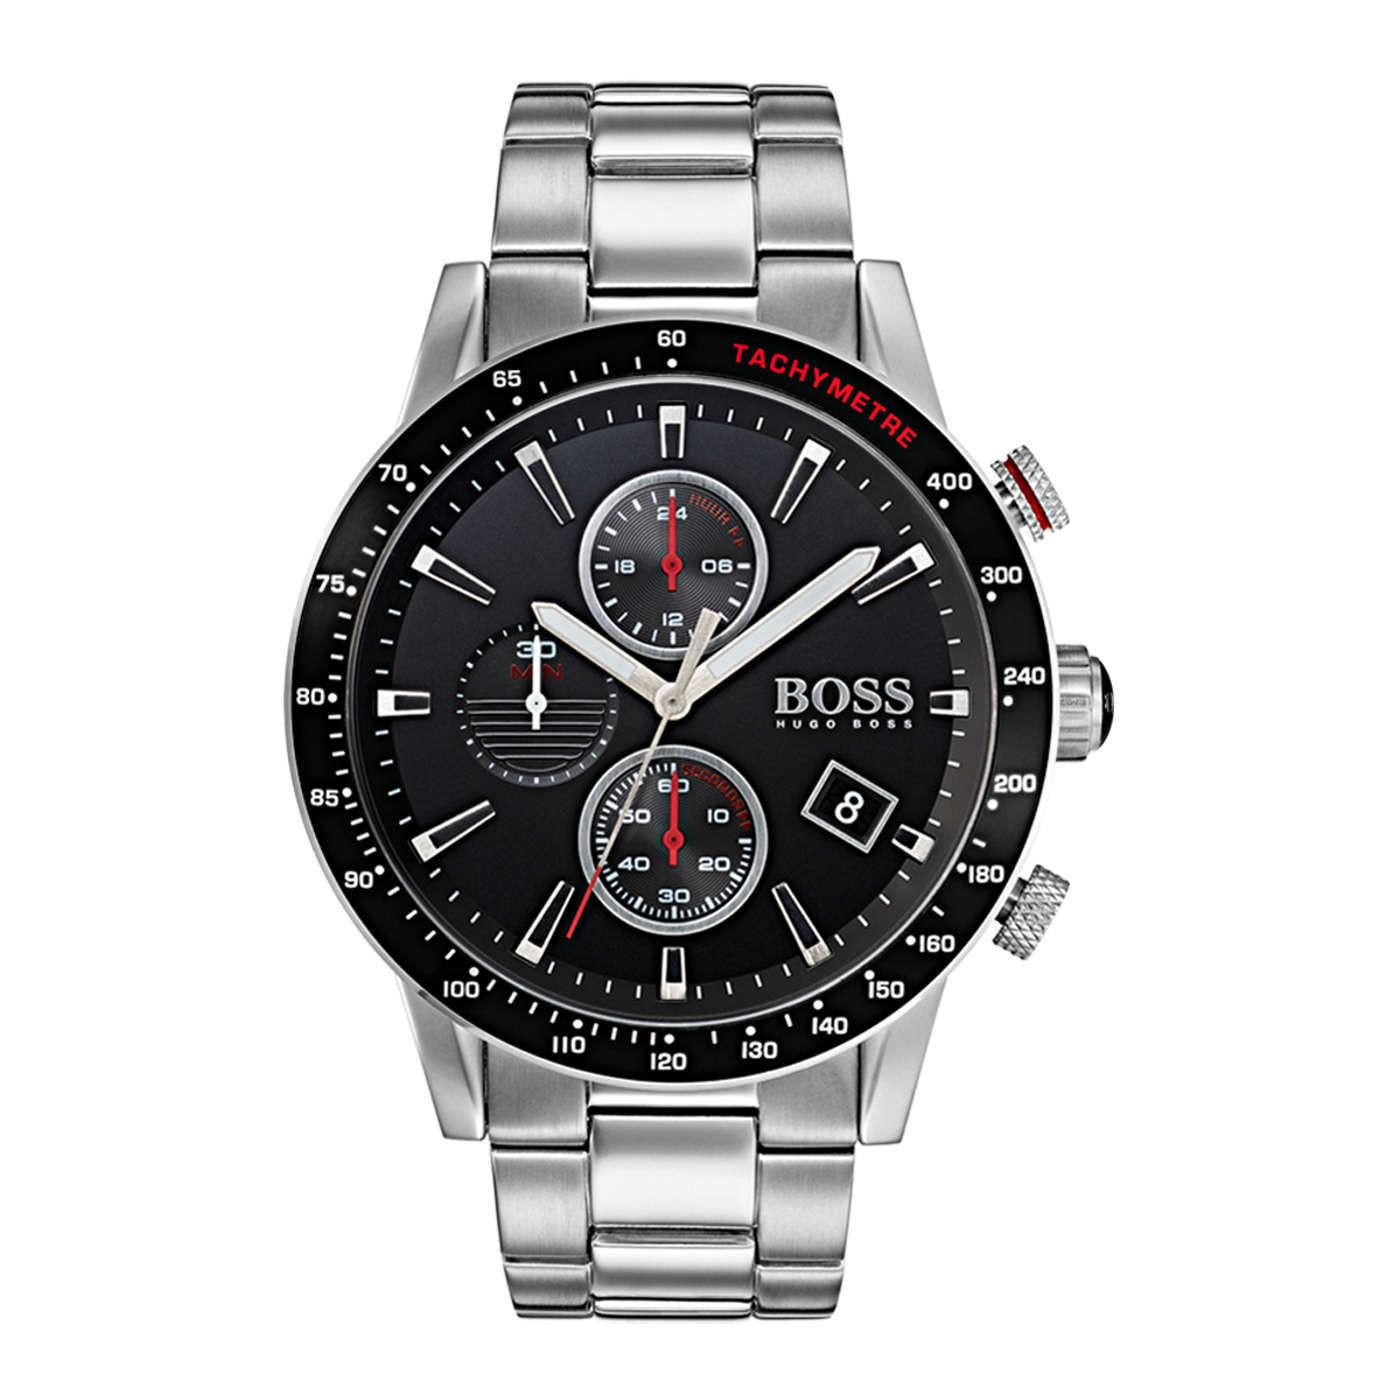 b01dbbbf78 Hugo Boss montre HB1513509 - Montres